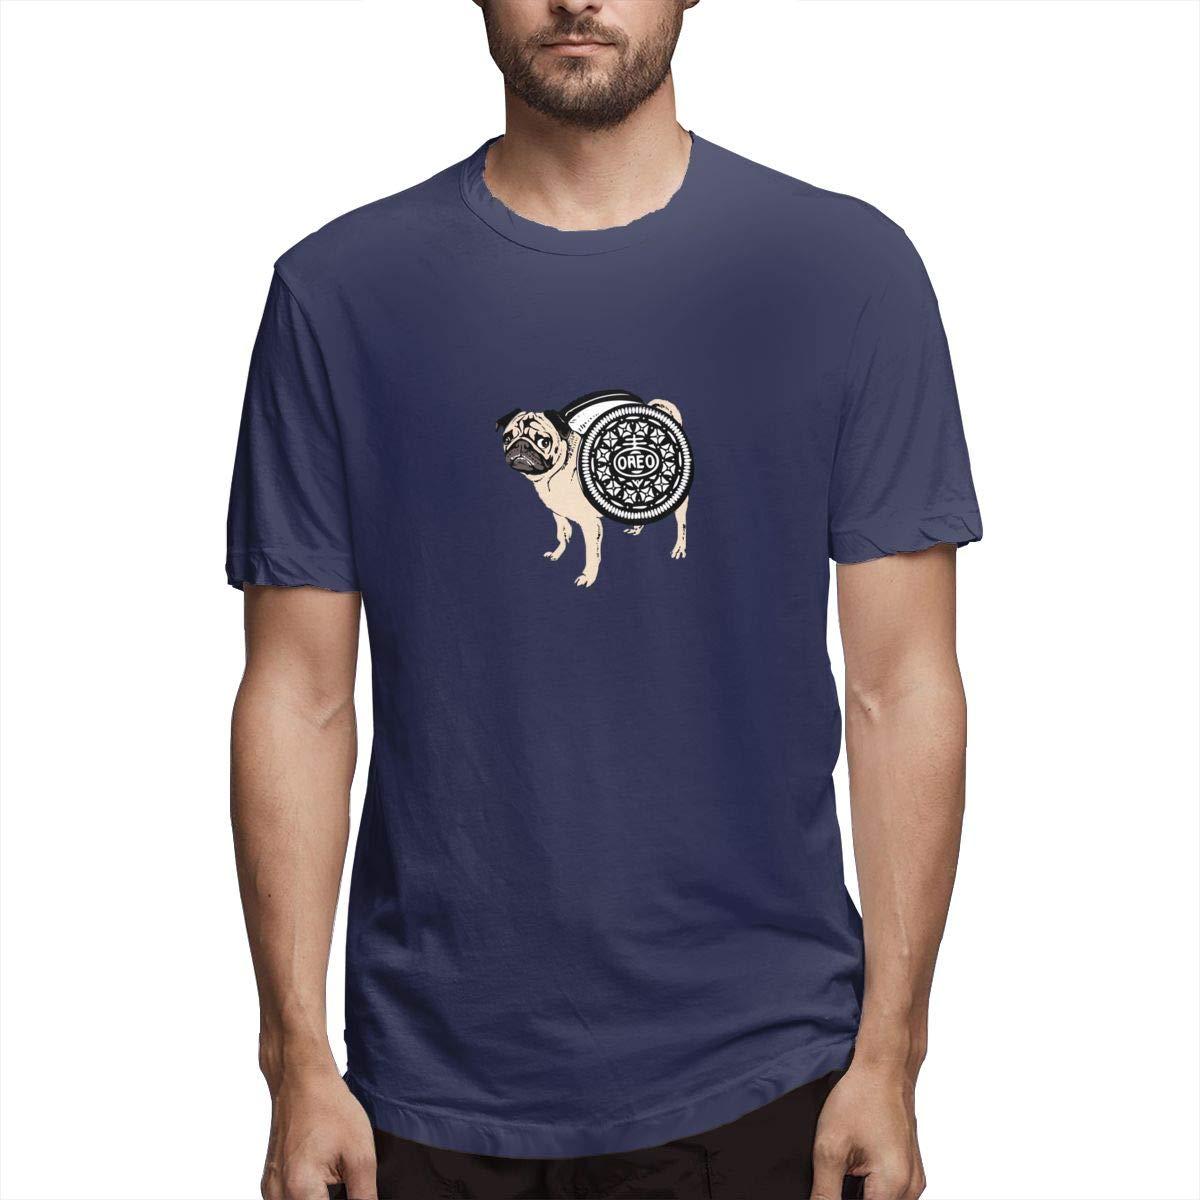 Sandwich Dog S T Shirt Original Design Casual T Shirts Top Tees Leisure Short Sleeve Round